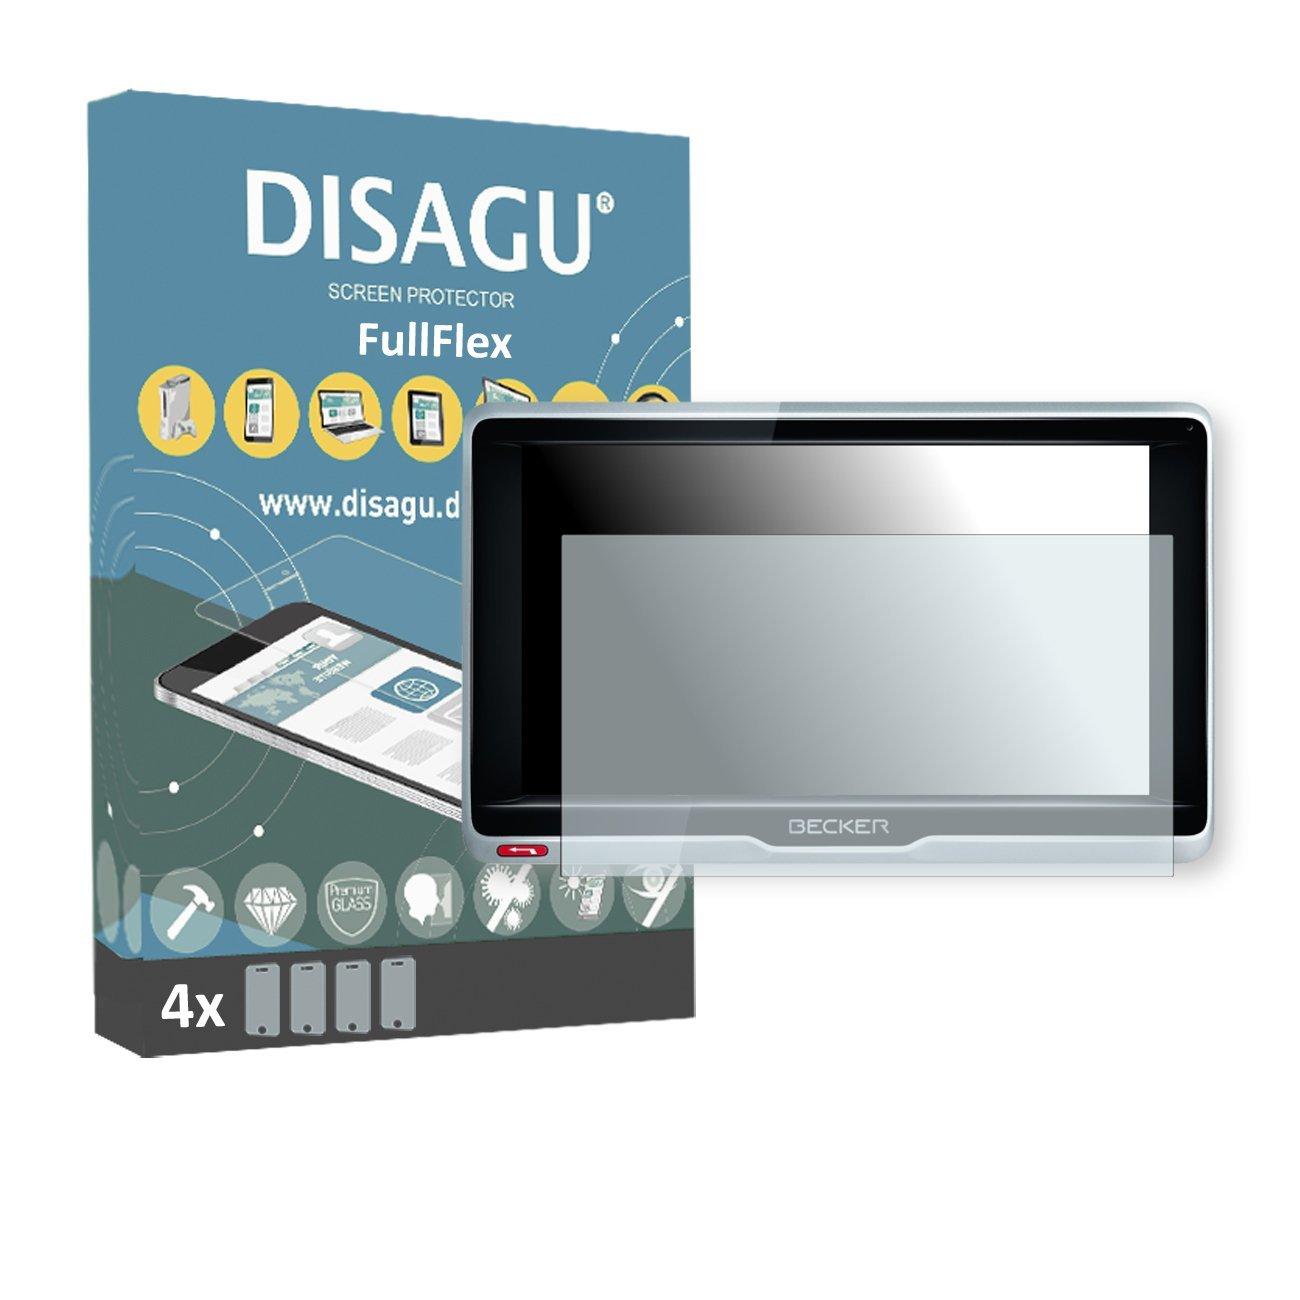 4 x Disagu FullFlex screen protector for Becker transit.6 LMU foil screen protector